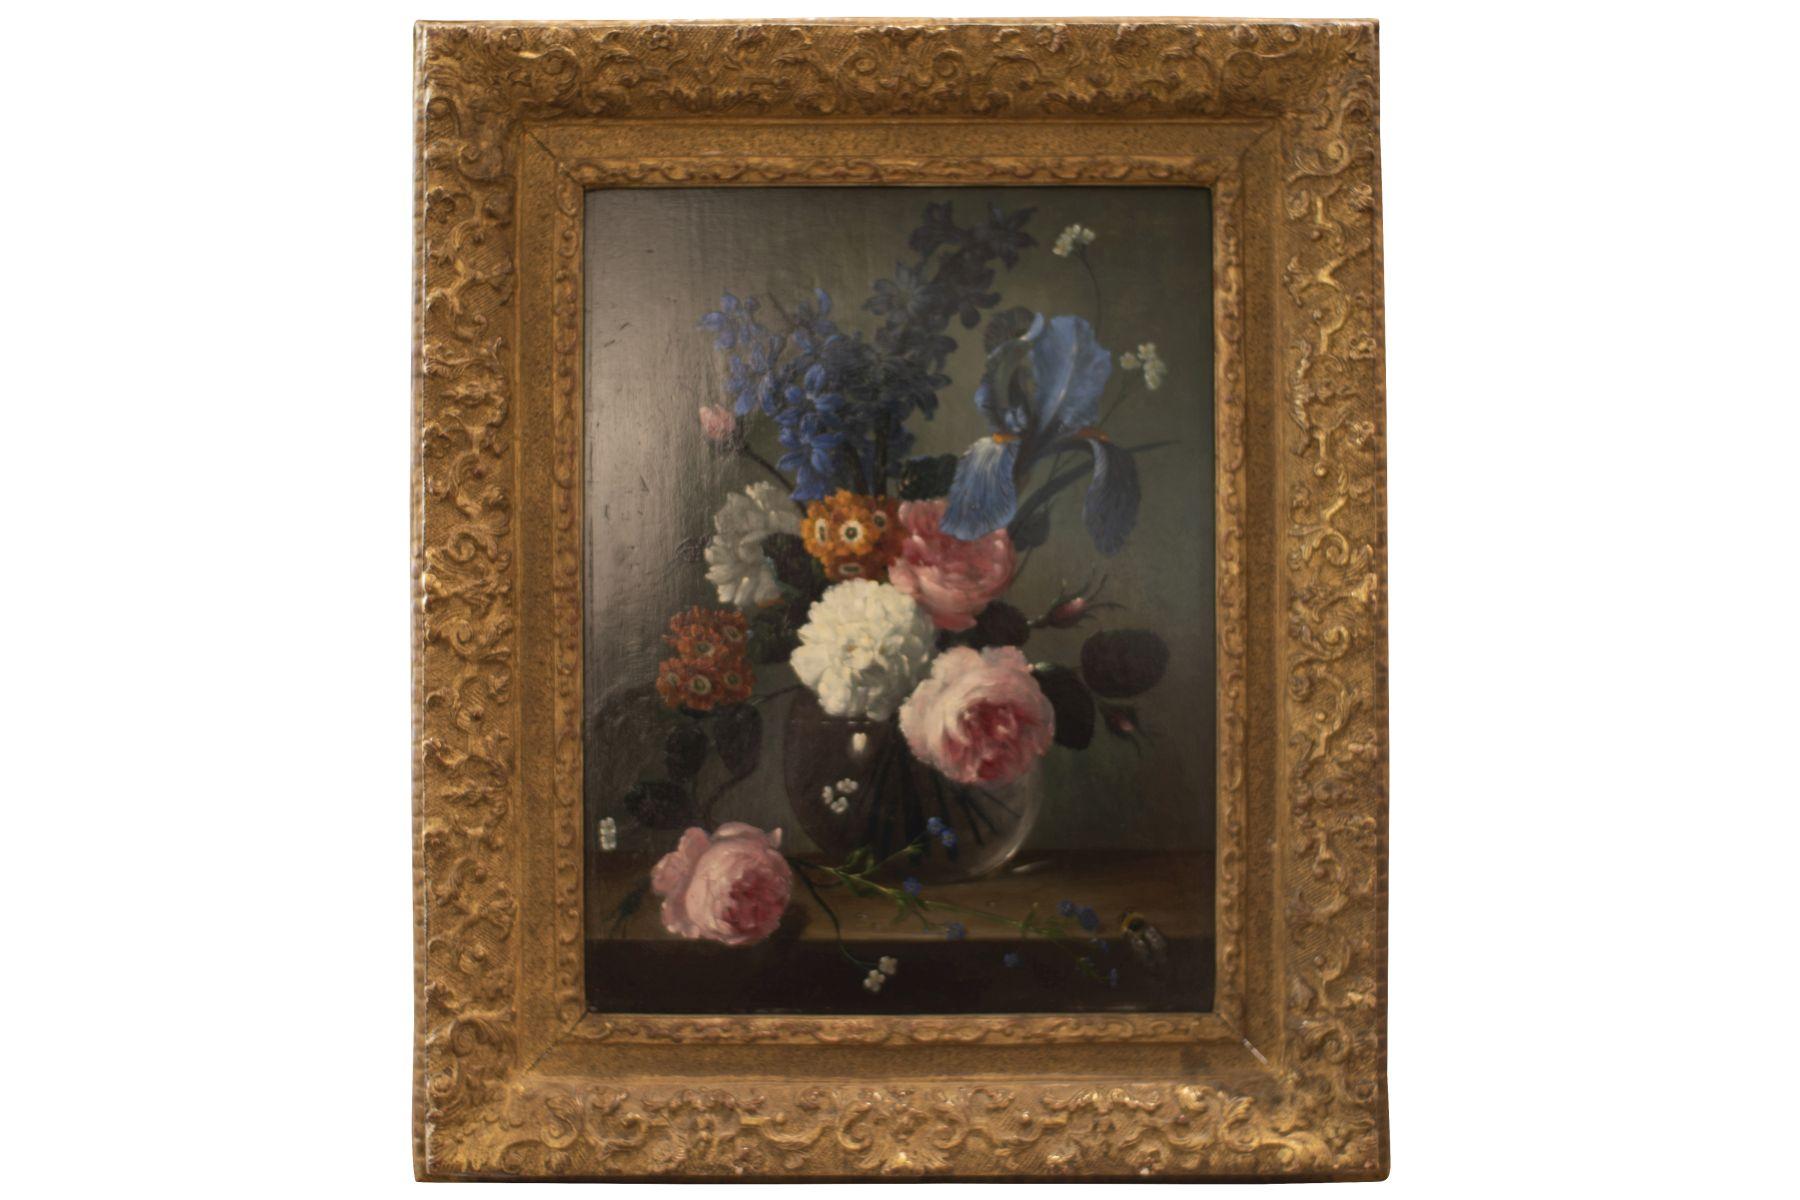 #127 Artist of the 20th C., Floral Still Life   Künstler des 20. Jh.s, Blumenstillleben Image